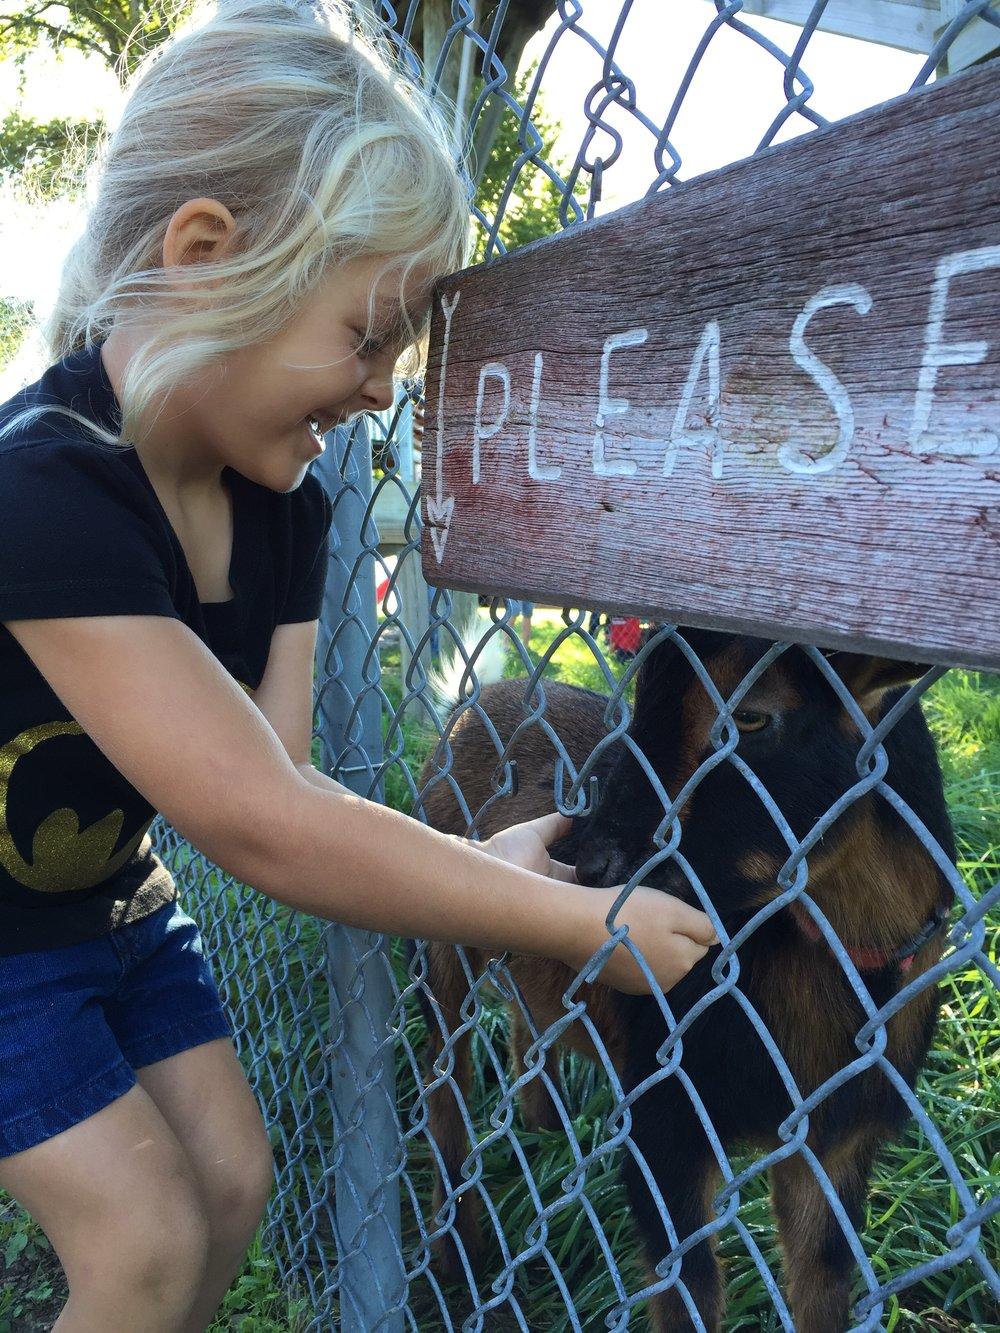 friskes-farm-market-petting-zoo.jpg